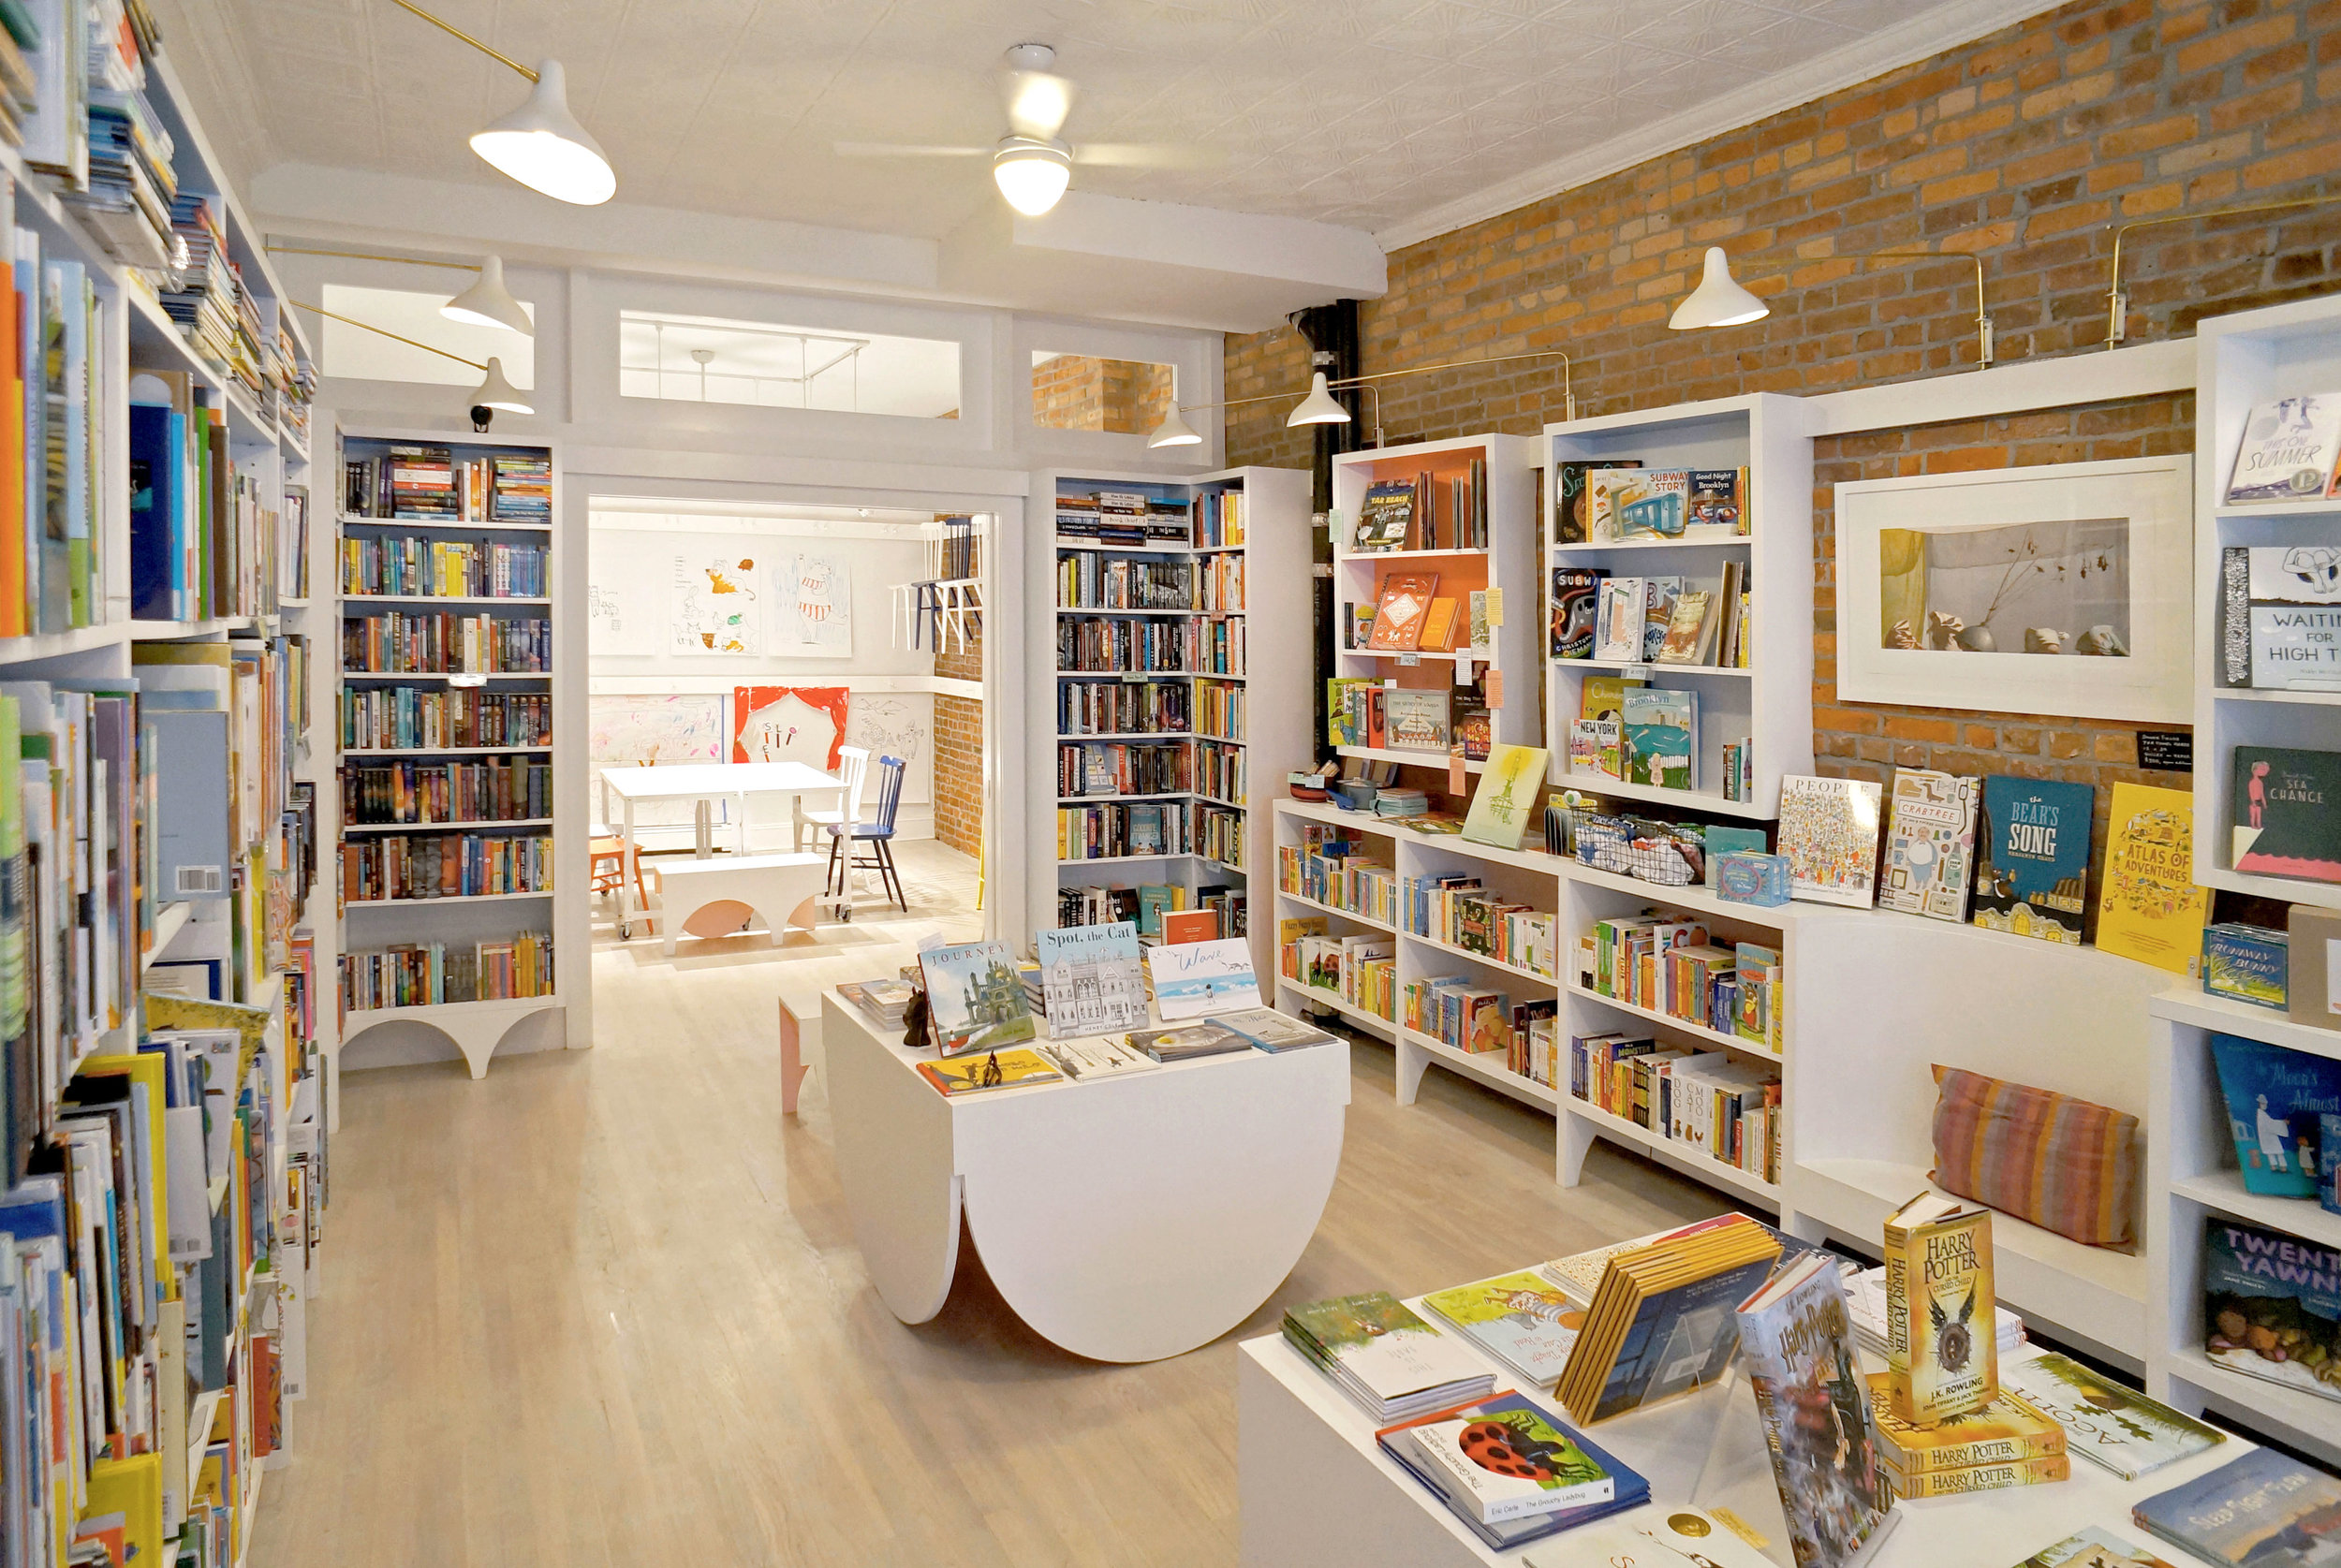 Stories bookshop Brooklyn, NY  Designer LANAS Inc.  2016